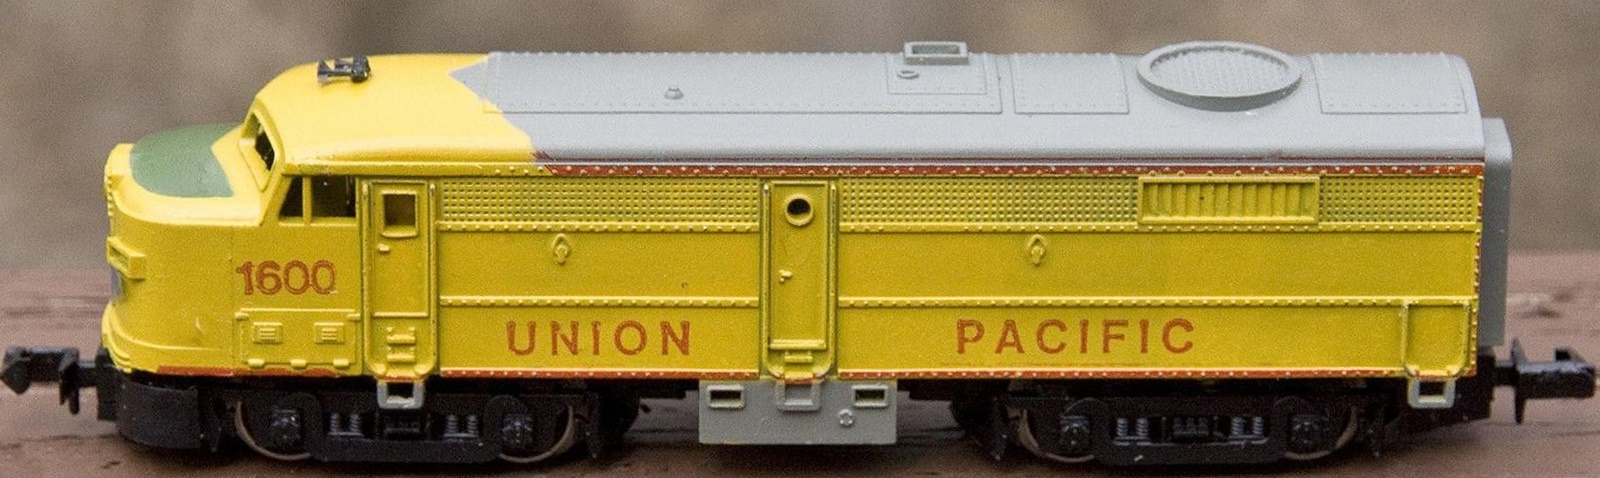 N Scale - Revell - 2322 - Locomotive, Diesel, Alco FA/FB - Union Pacific - 1600